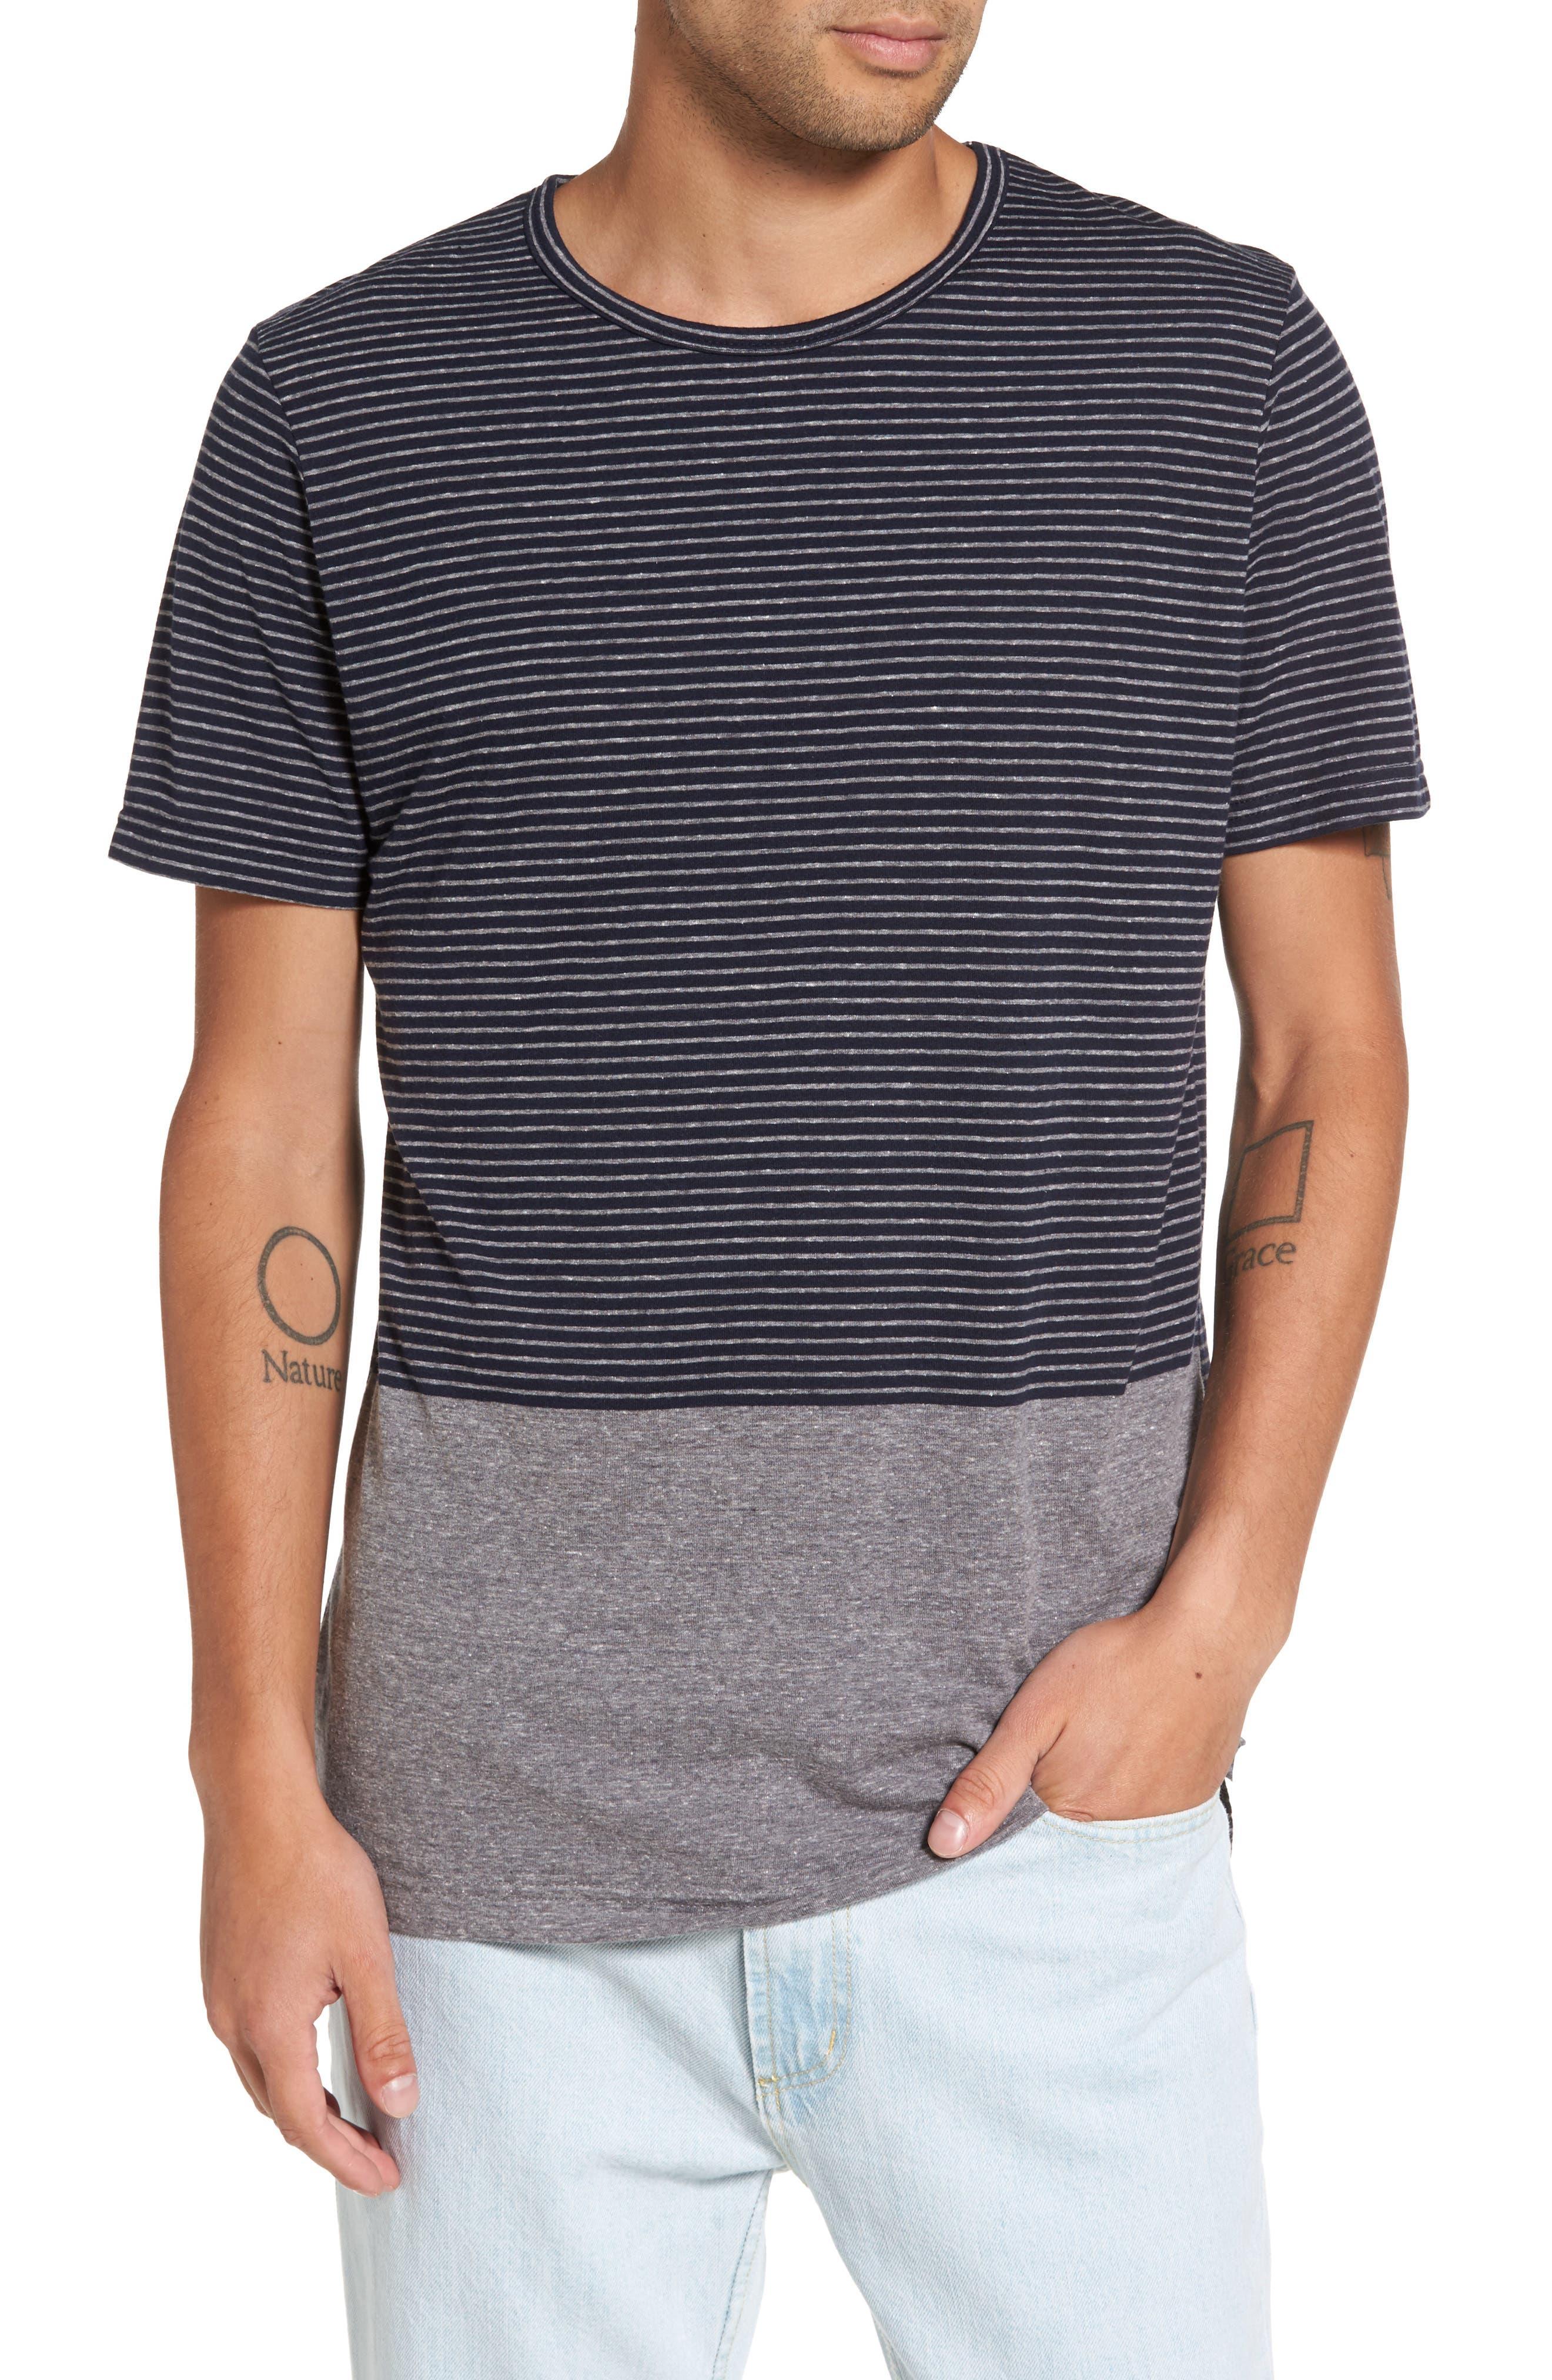 GLOBE Moonshine Stripe Jersey T-Shirt